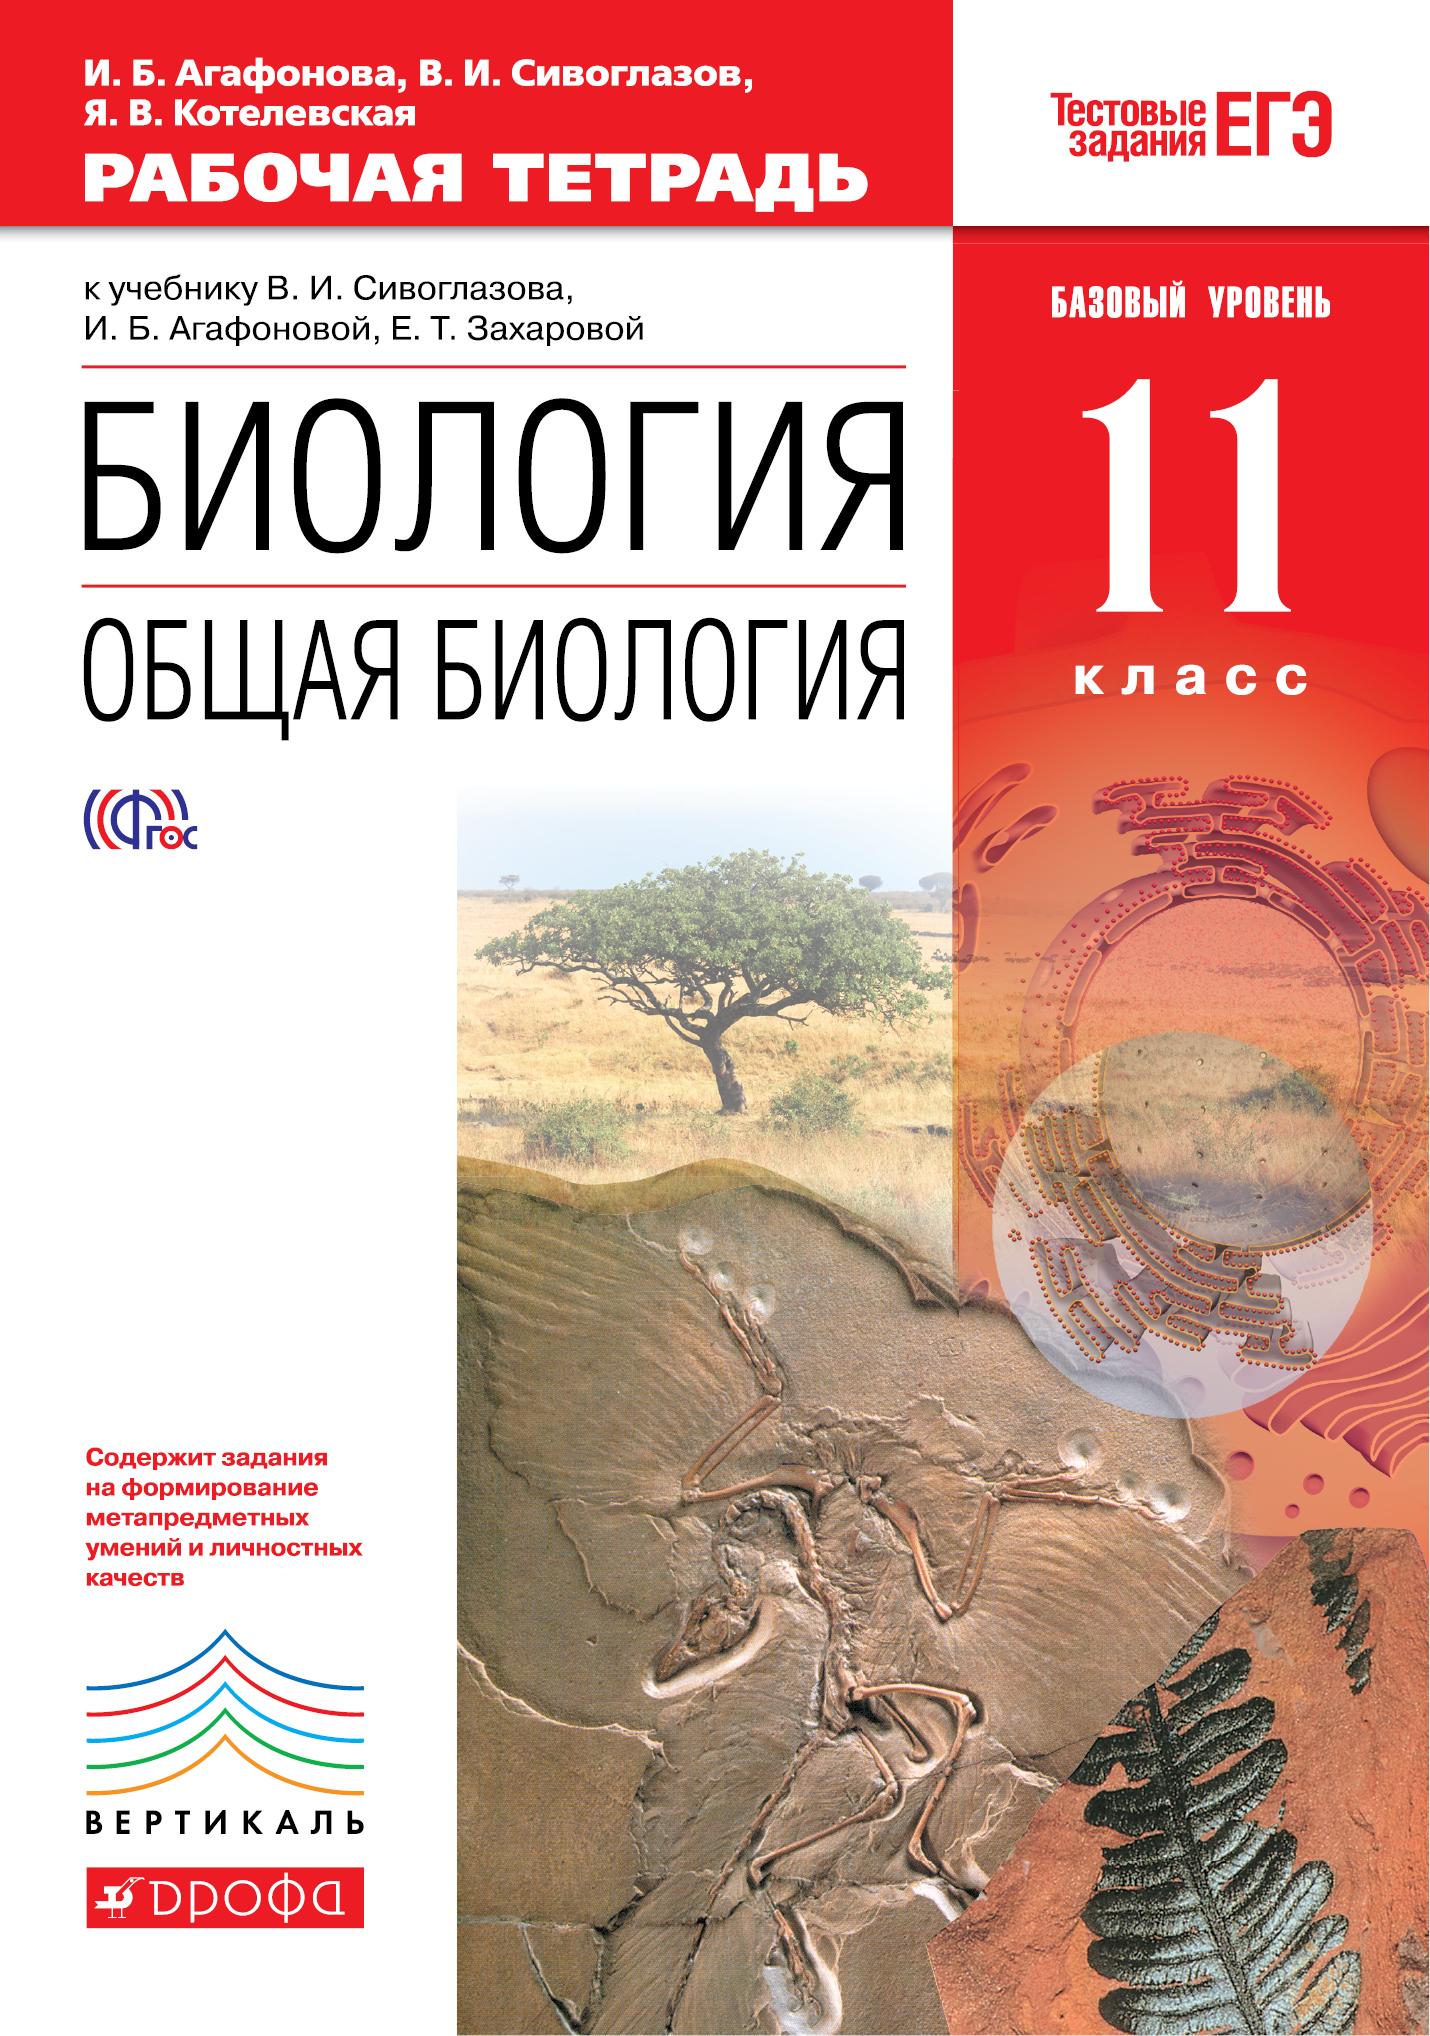 Общая биология 11кл [Р/т+ЕГЭ] баз. ур. Вертикаль